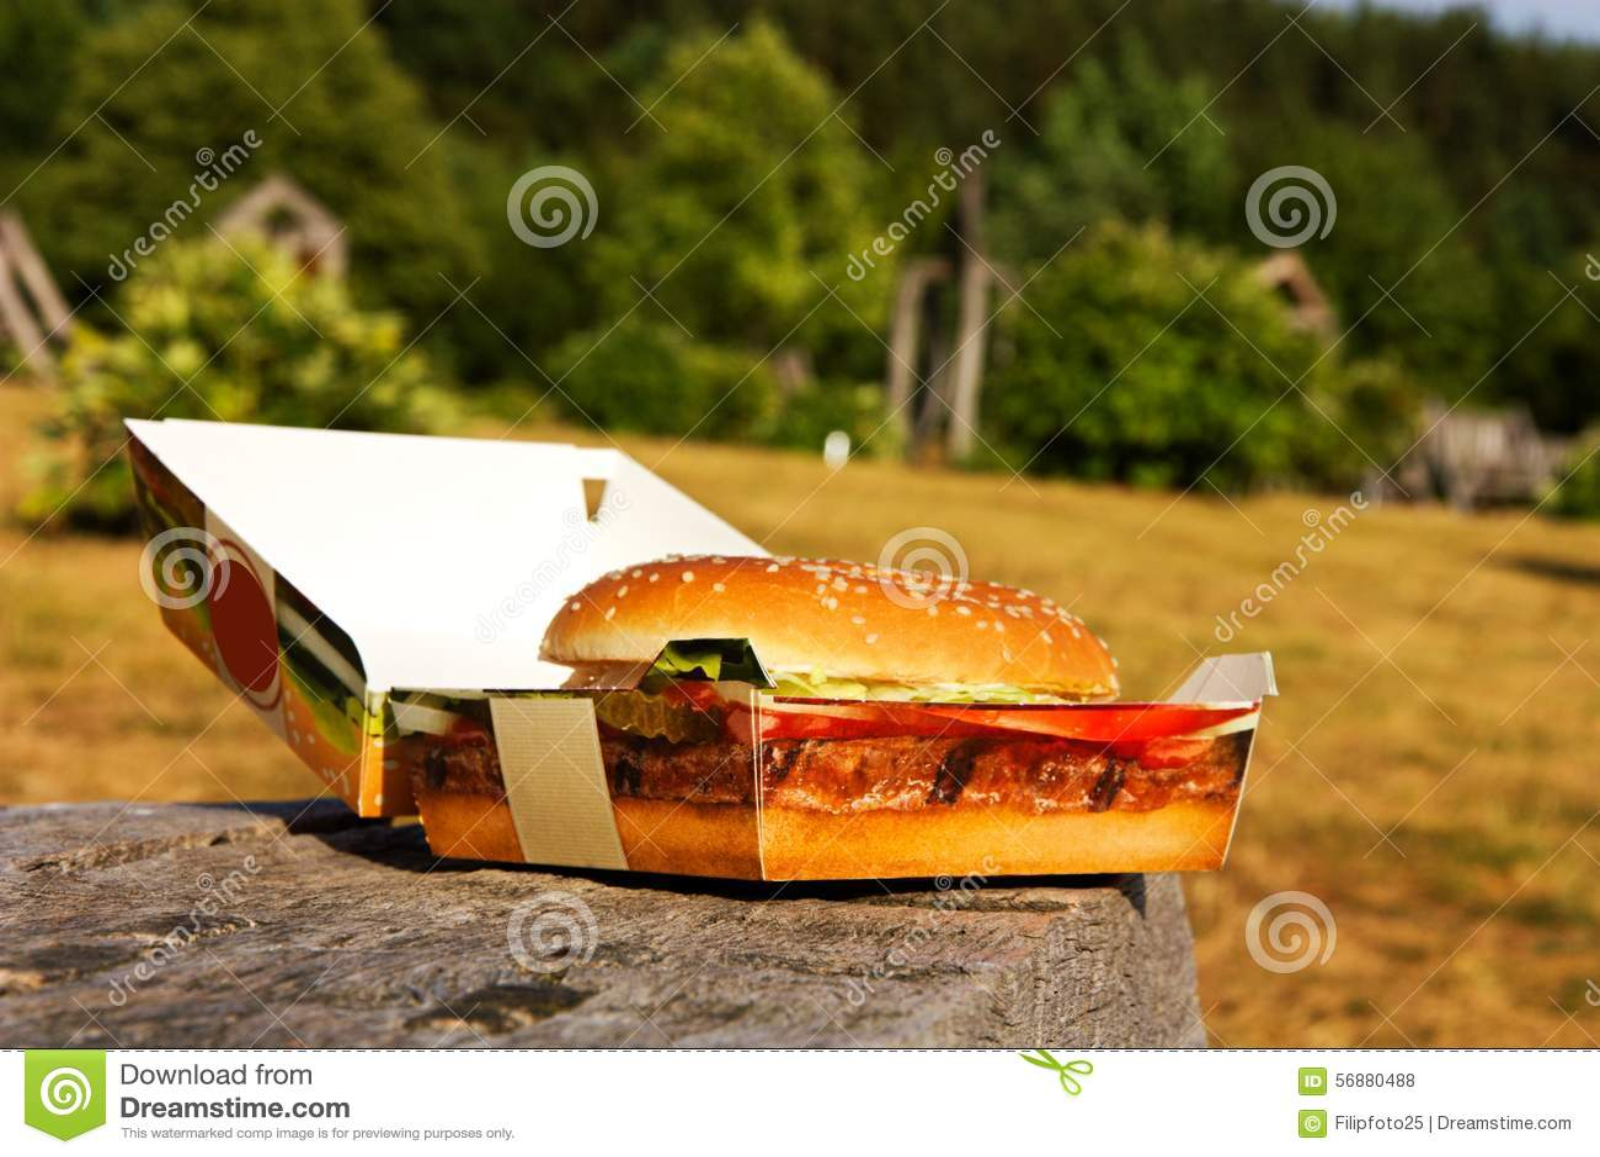 Hamburger in una scatola